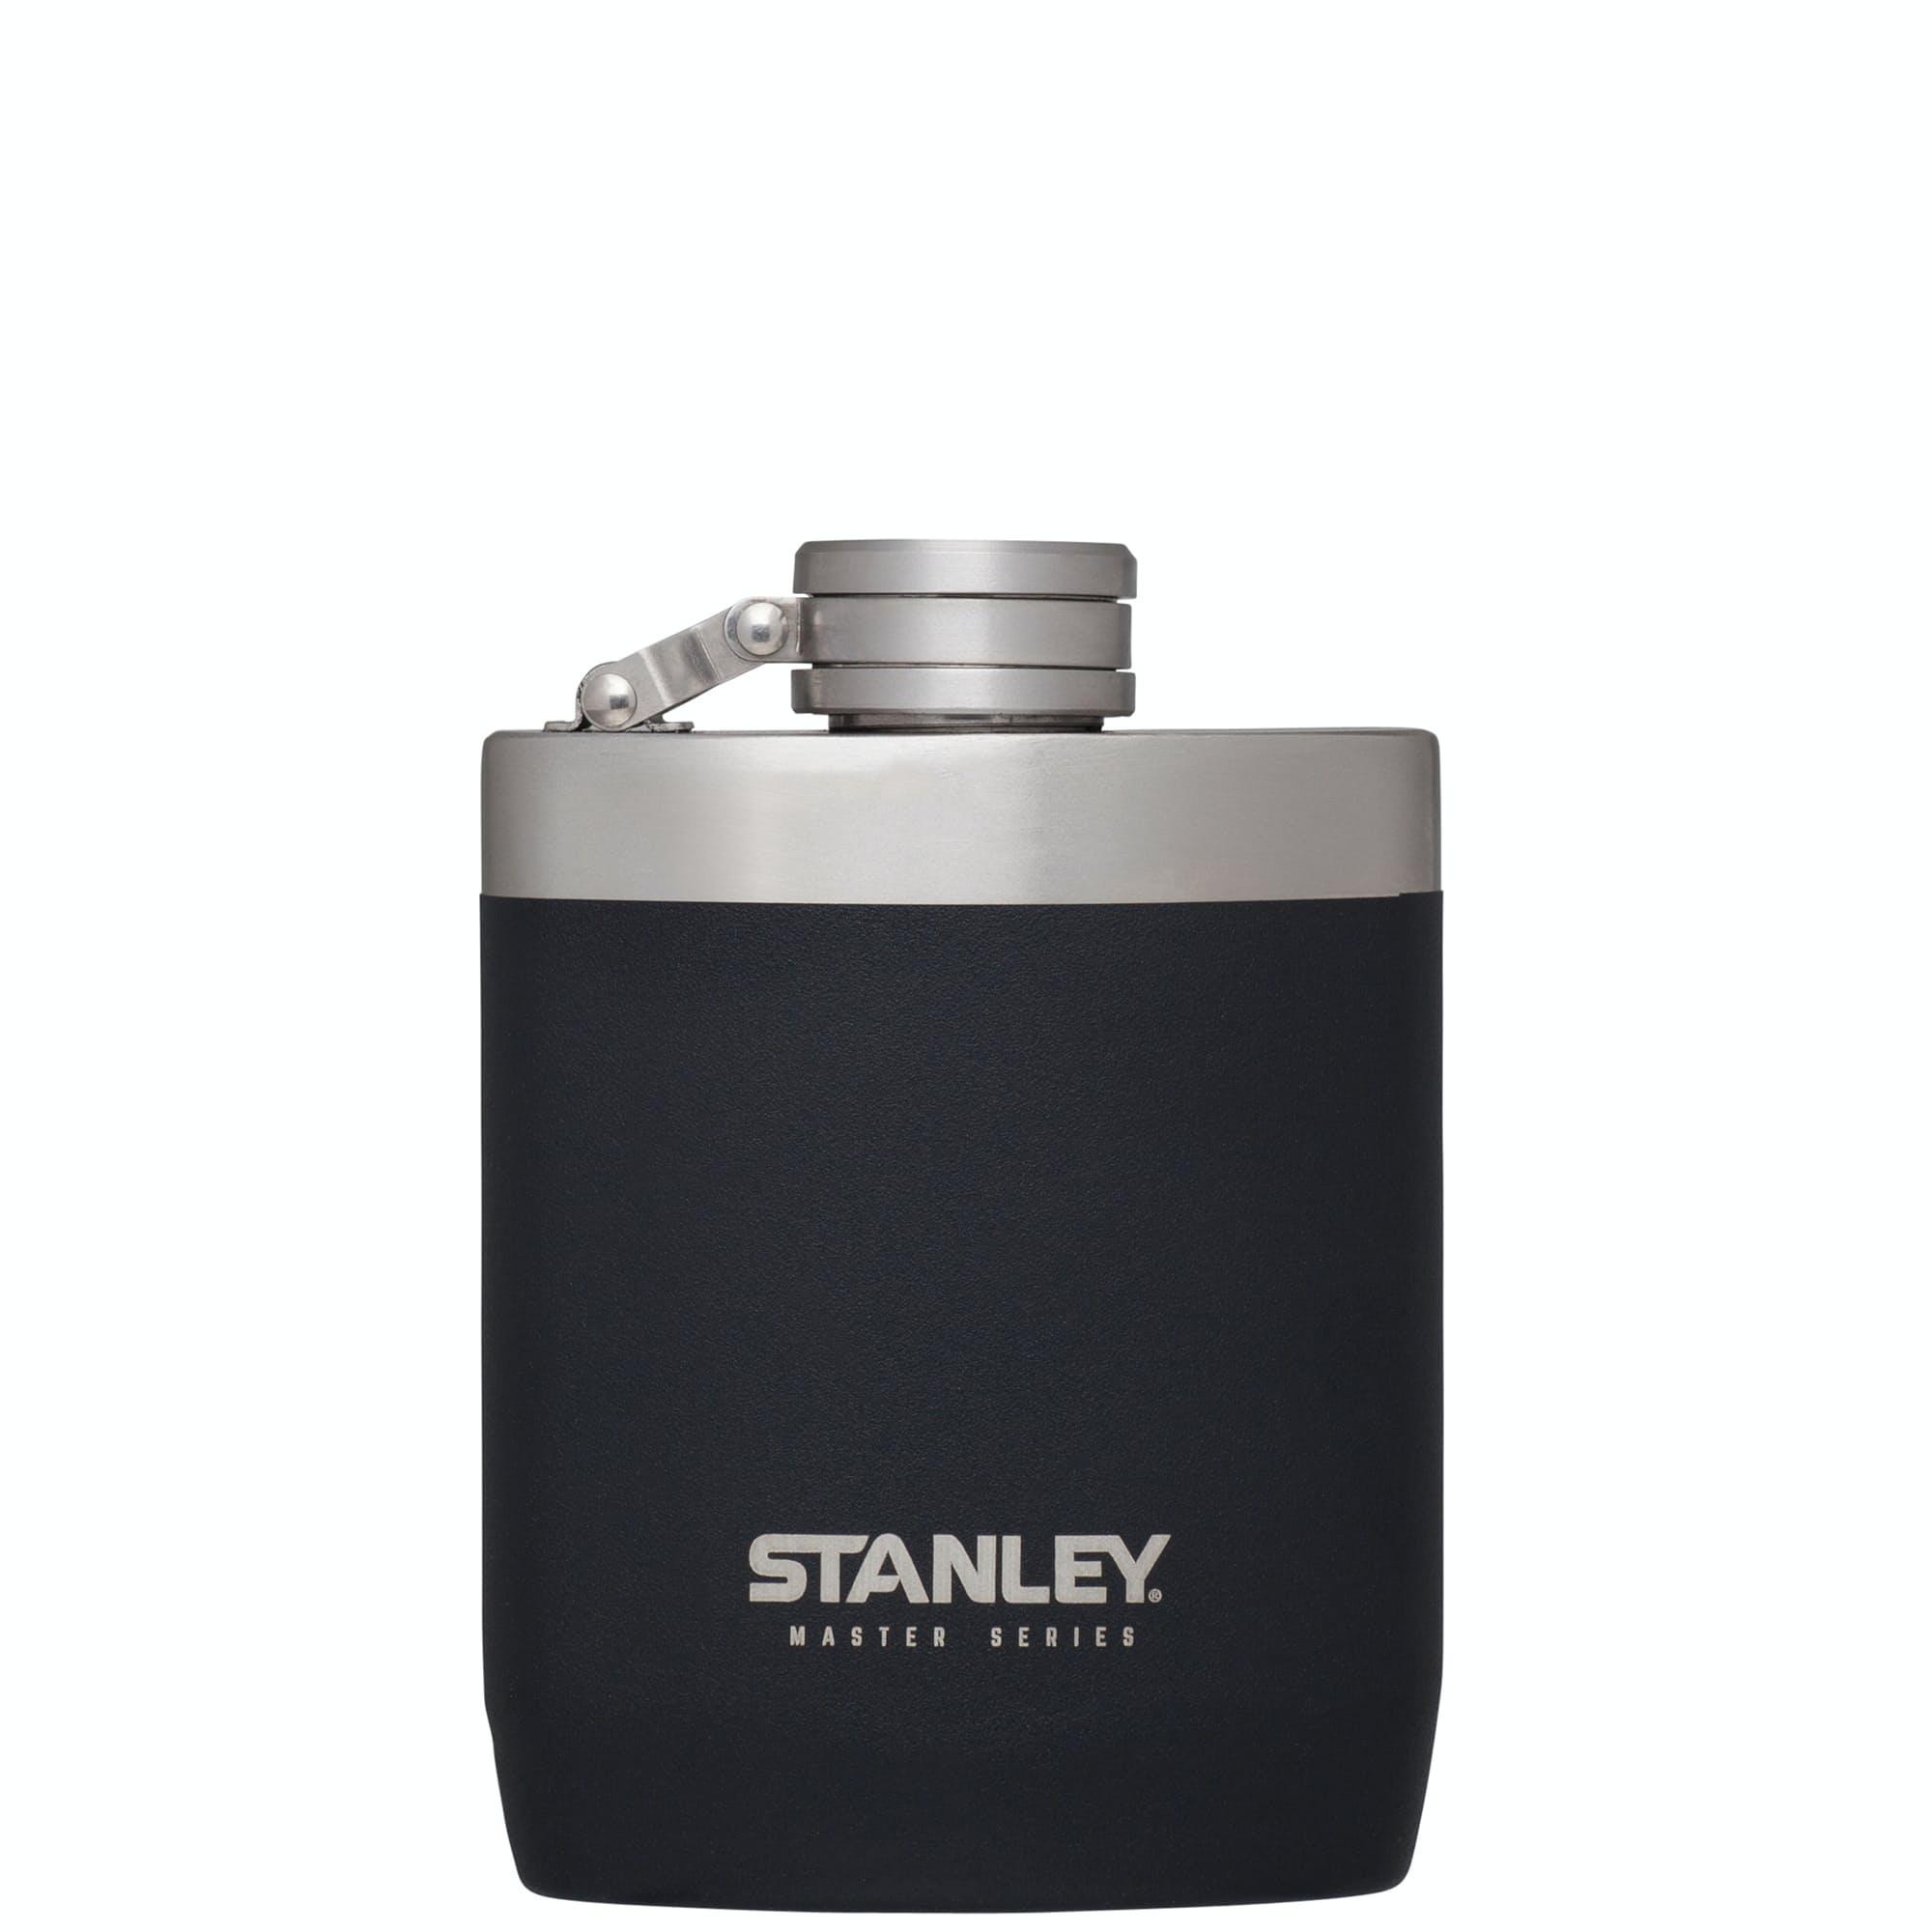 Iypd4ble55 stanley master flask 8oz 0 original